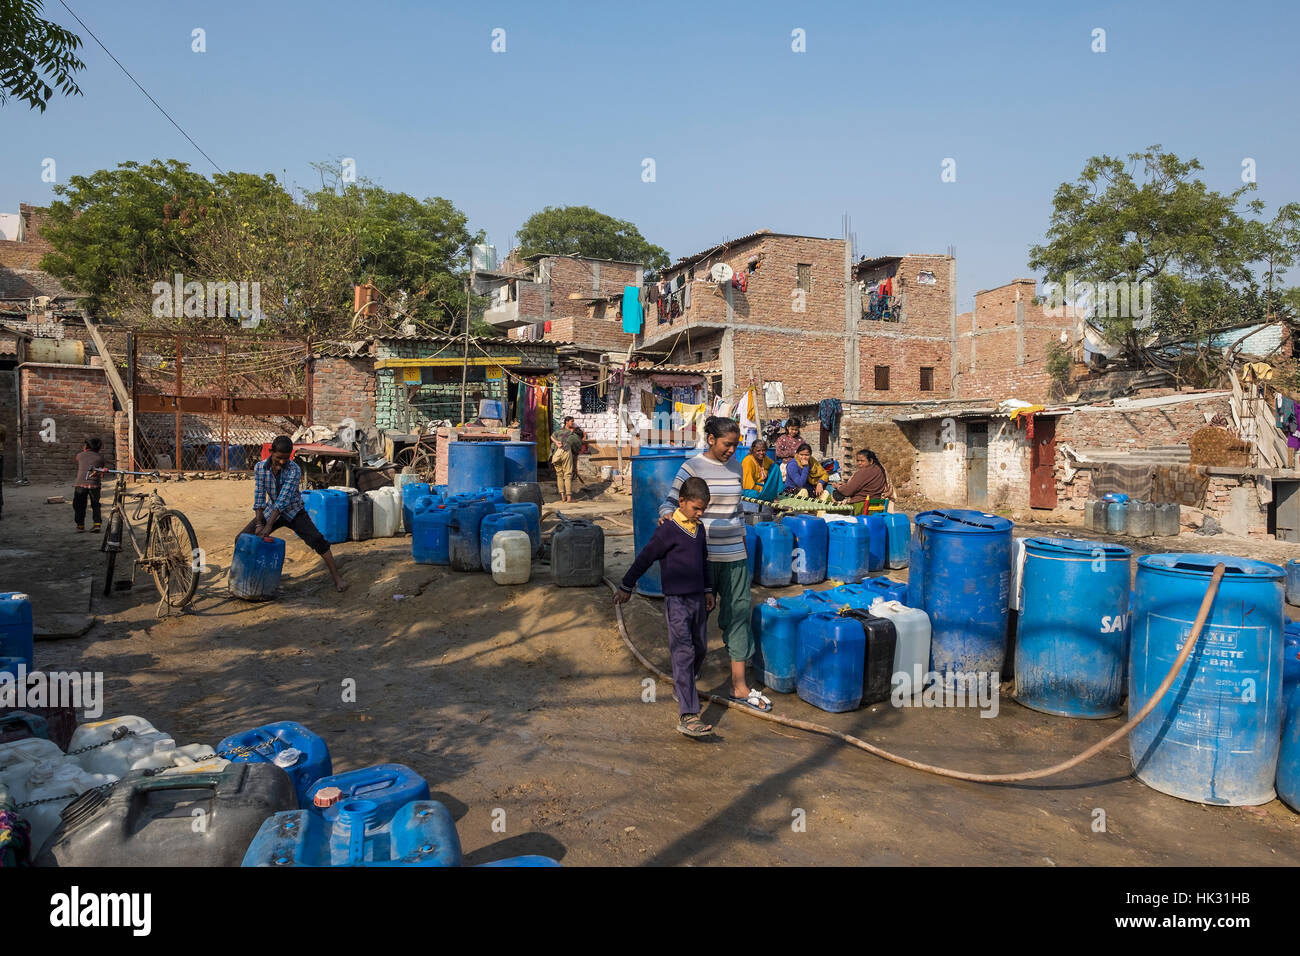 India, New Delhi, Baljeer Nagar Slum - Stock Image